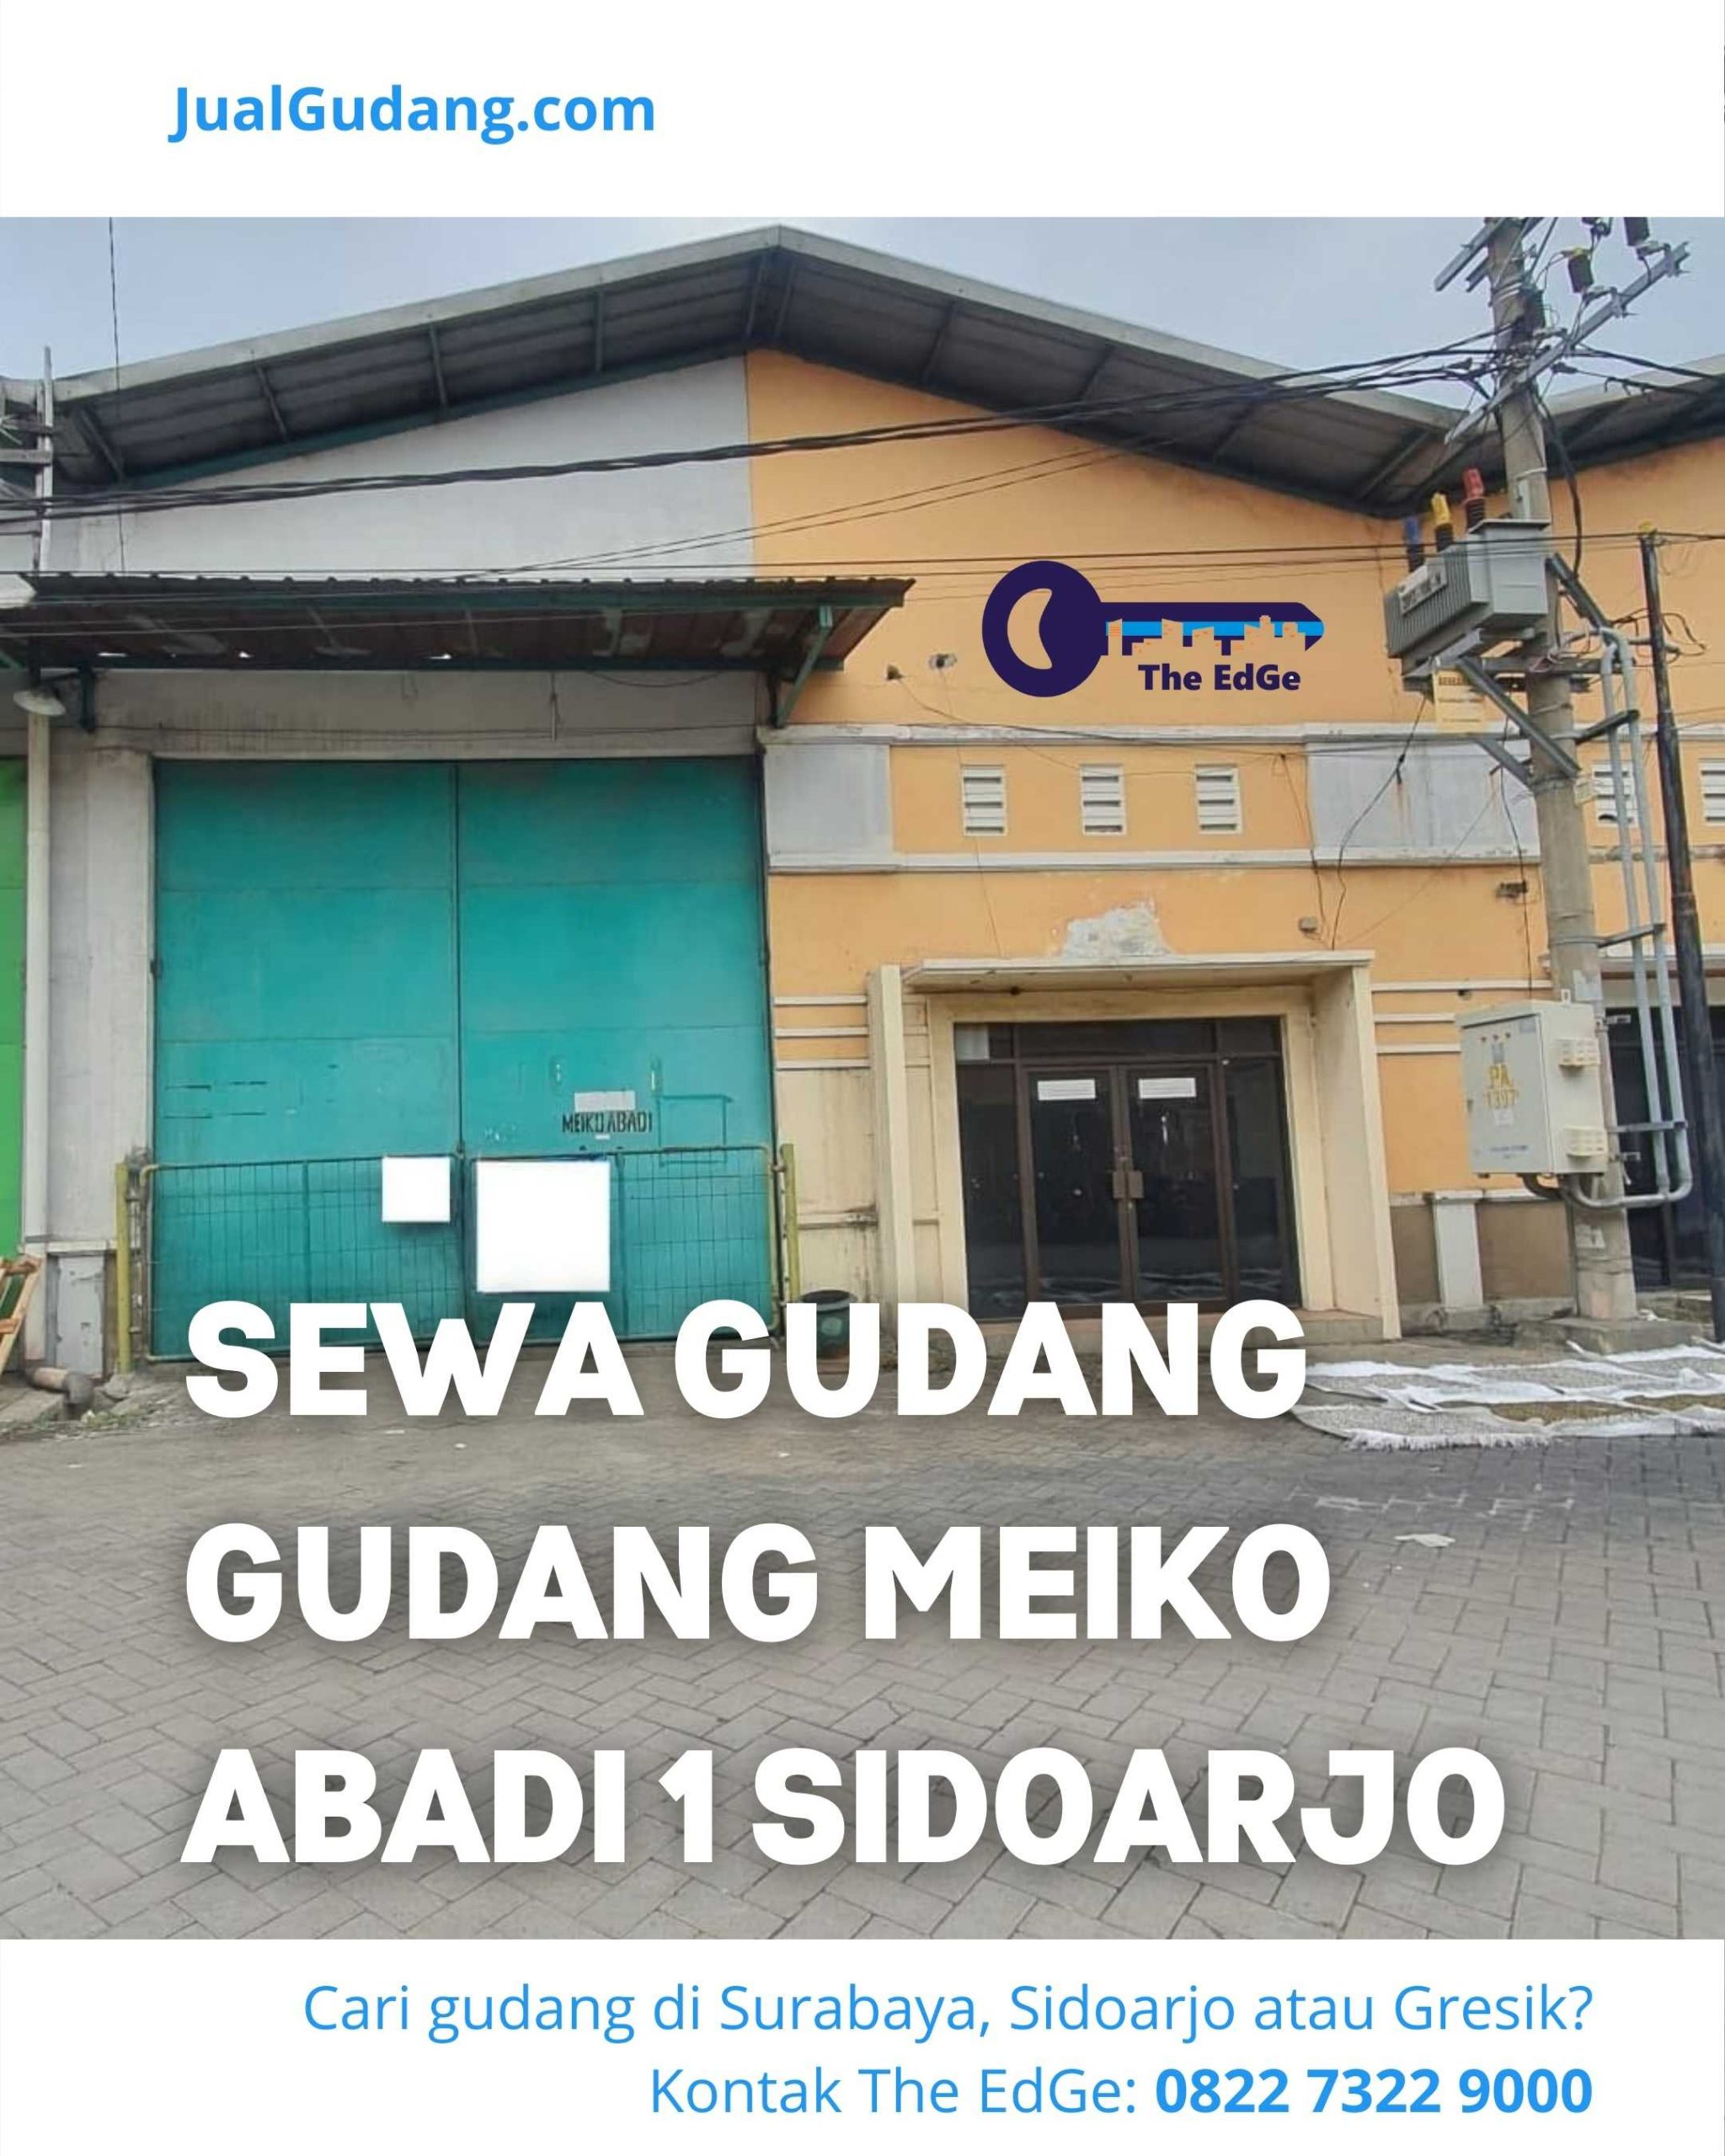 Sewa Gudang Gudang Meiko Abadi 1 Sidoarjo - JualGudang - IG